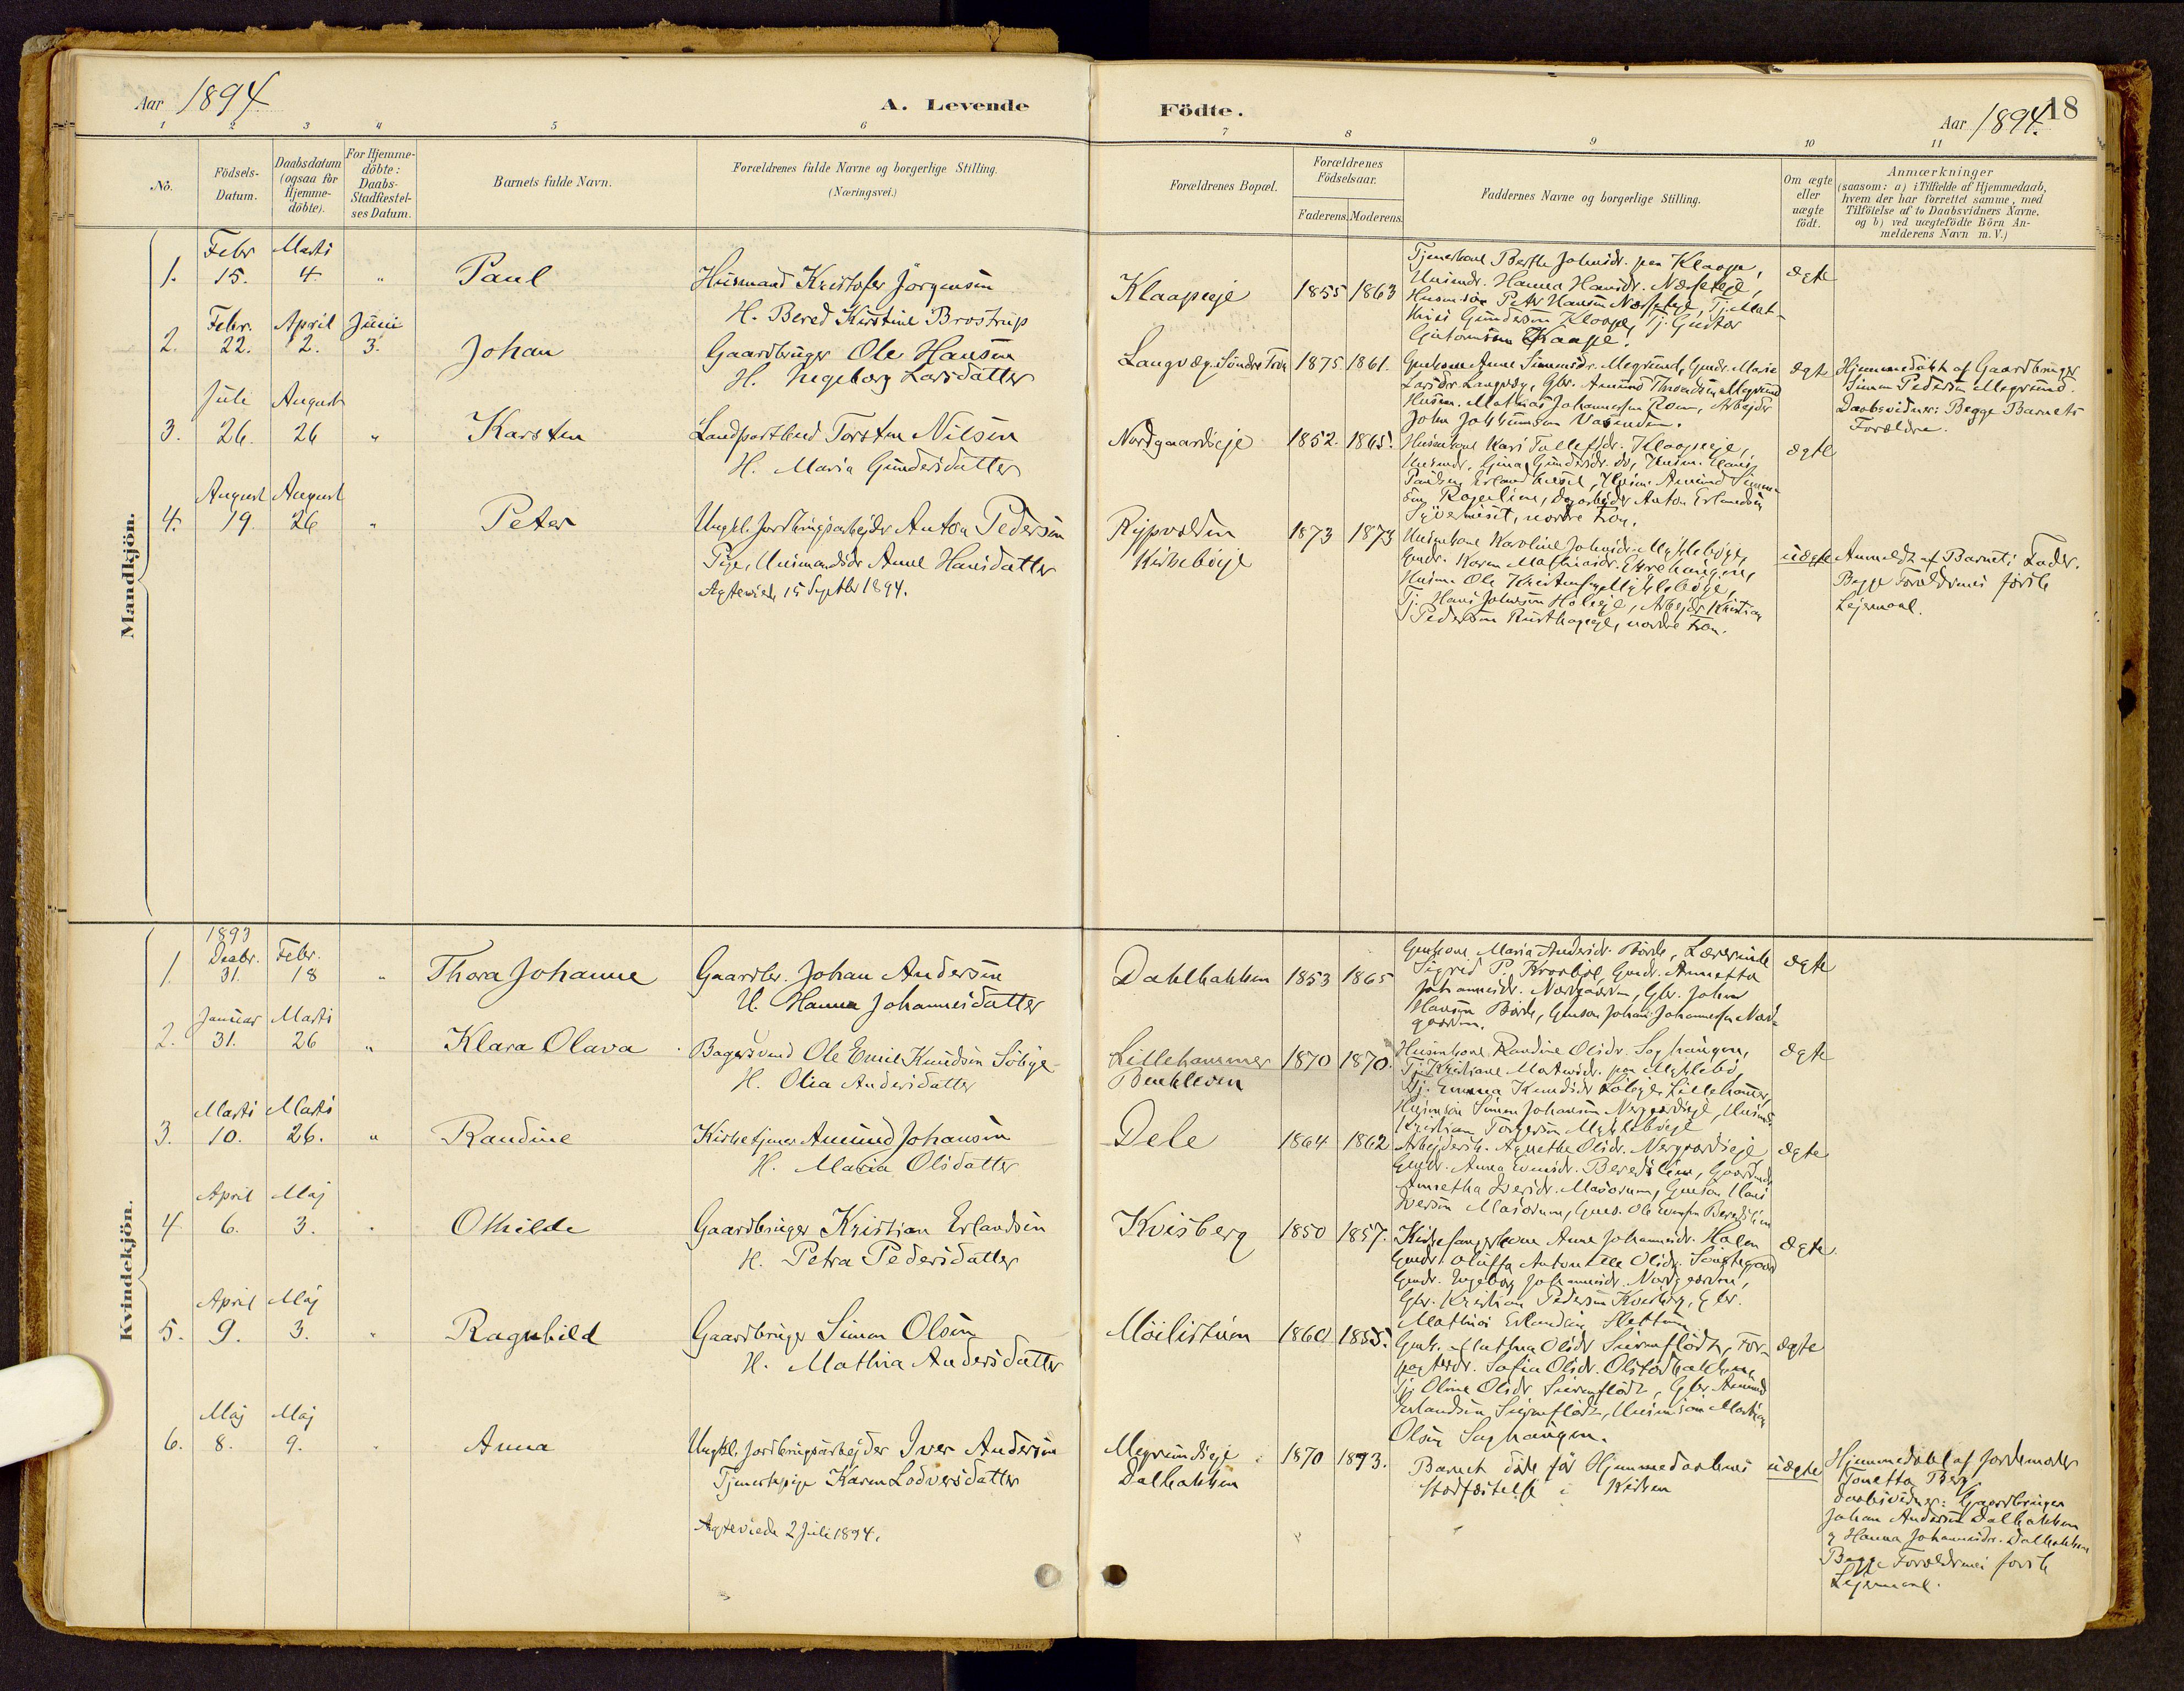 SAH, Vestre Gausdal prestekontor, Ministerialbok nr. 2, 1887-1918, s. 18